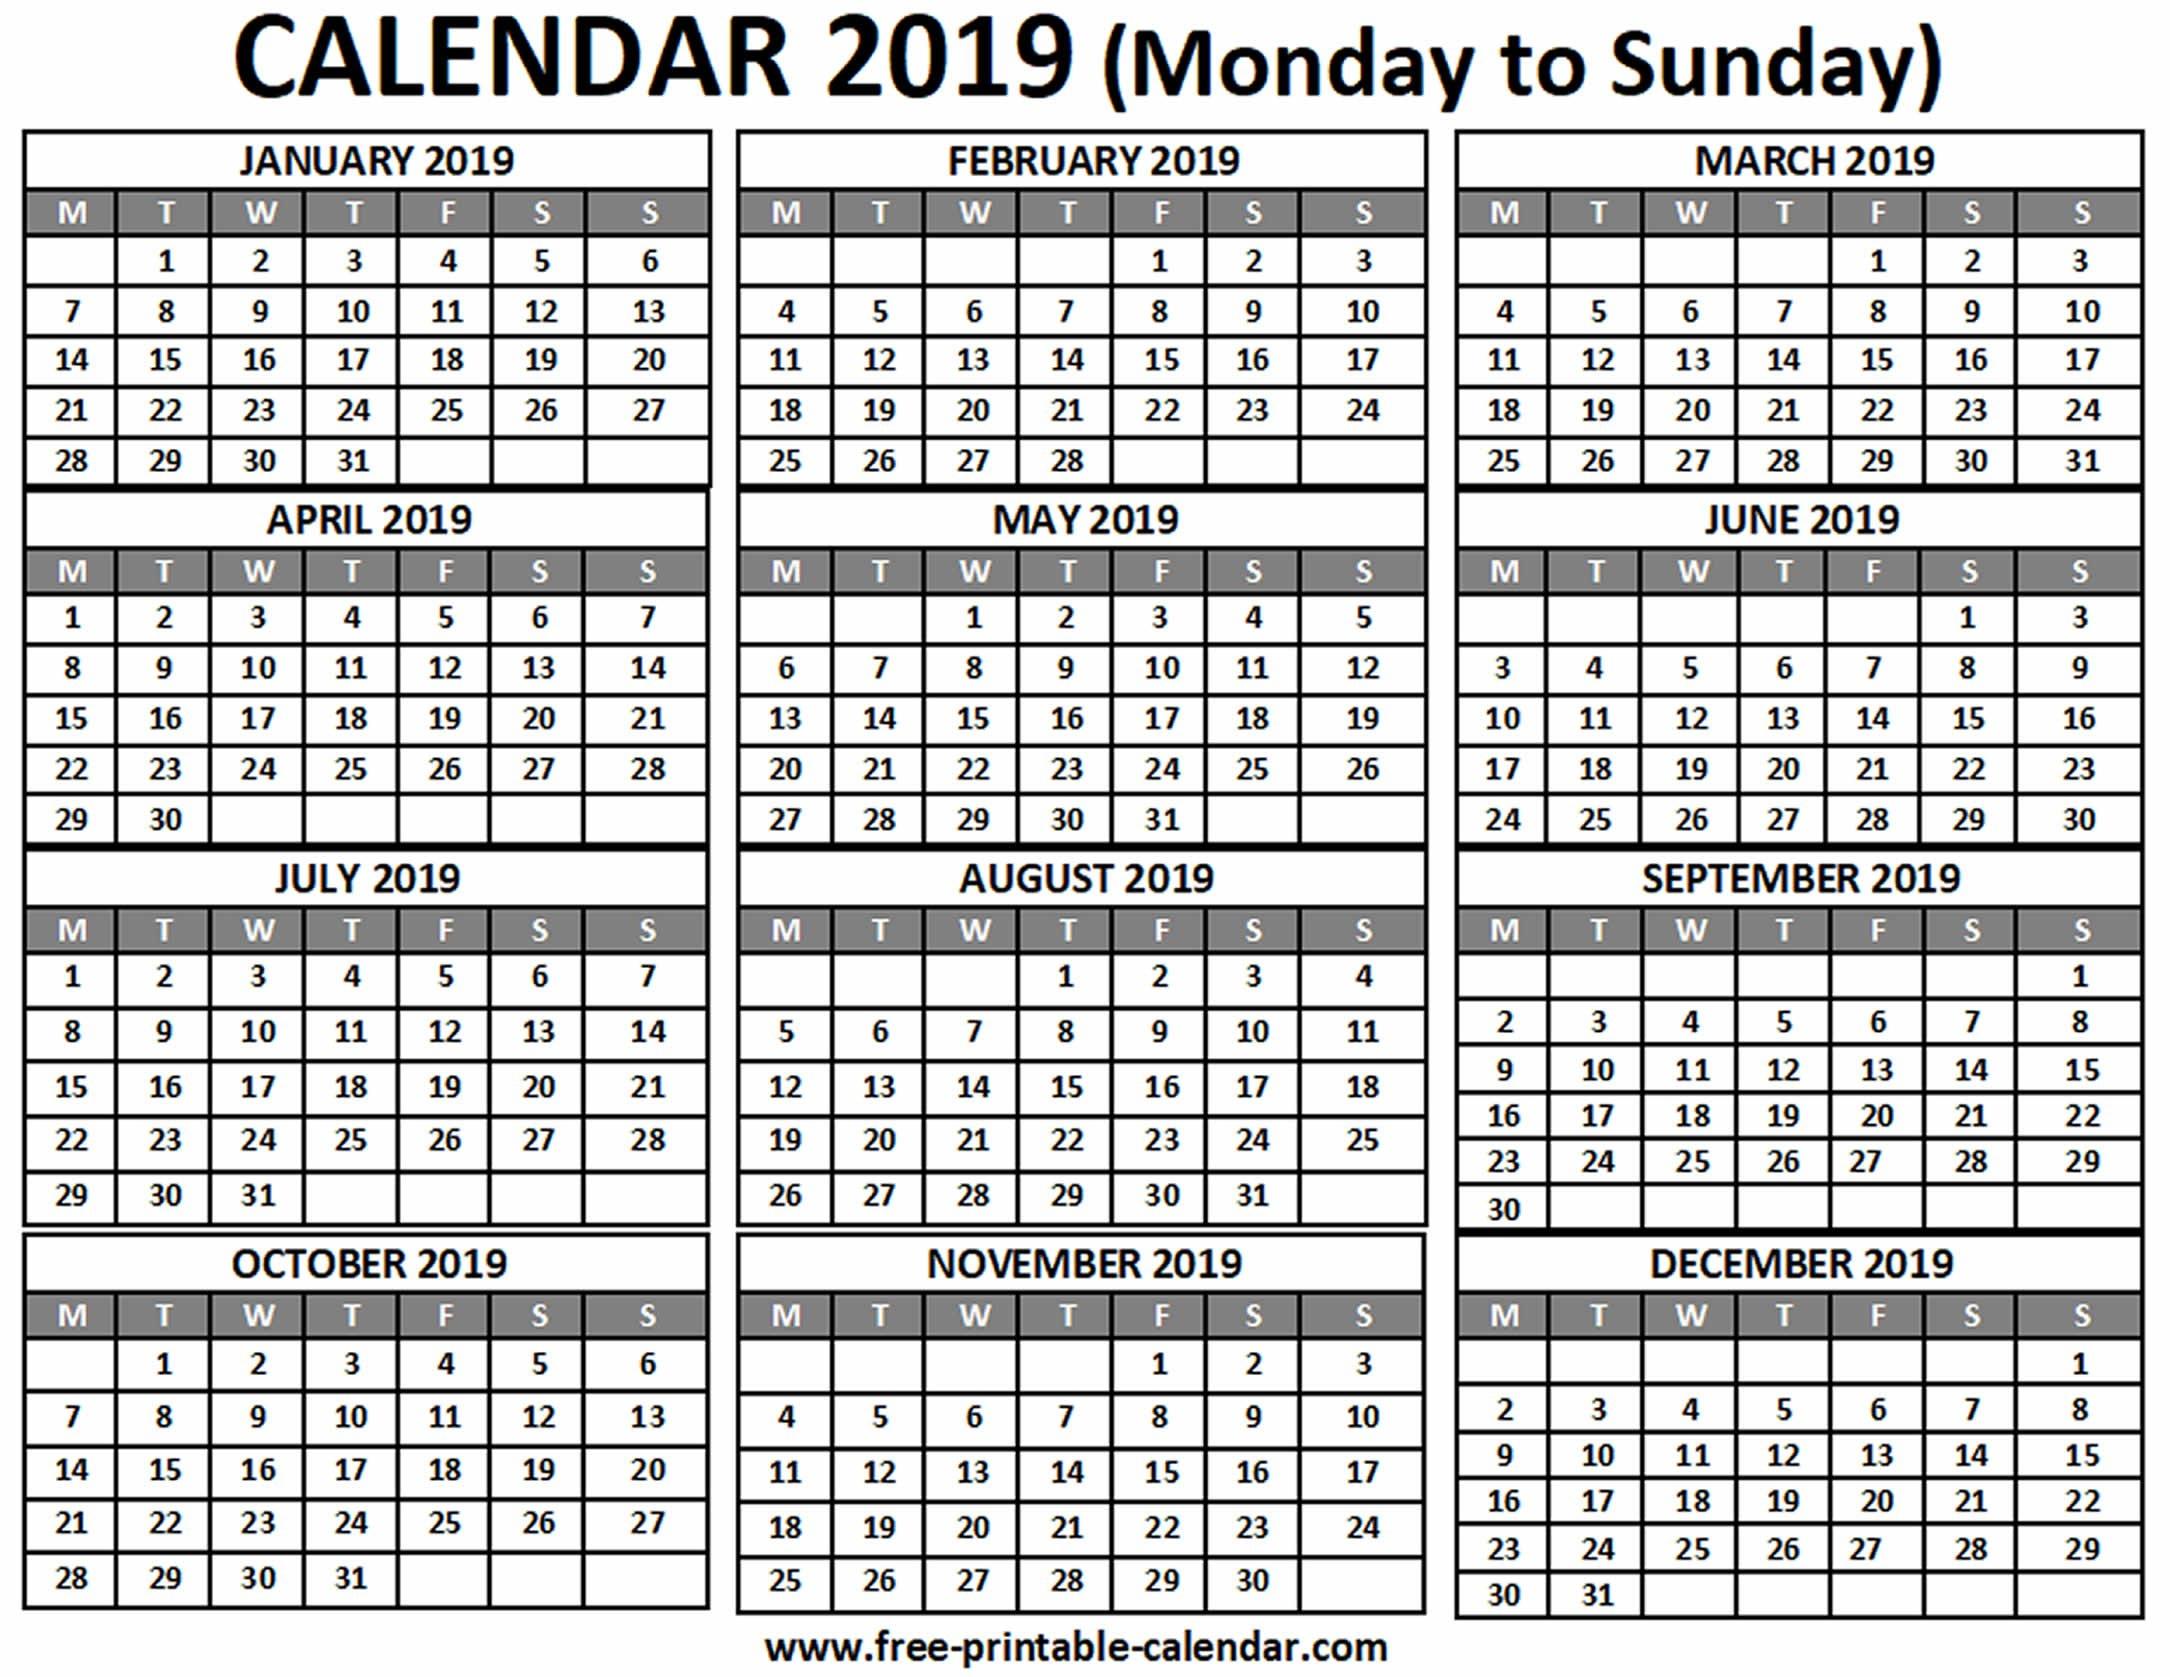 2019 Calendar – Free Printable Calendar Term 1 Calendar 2019